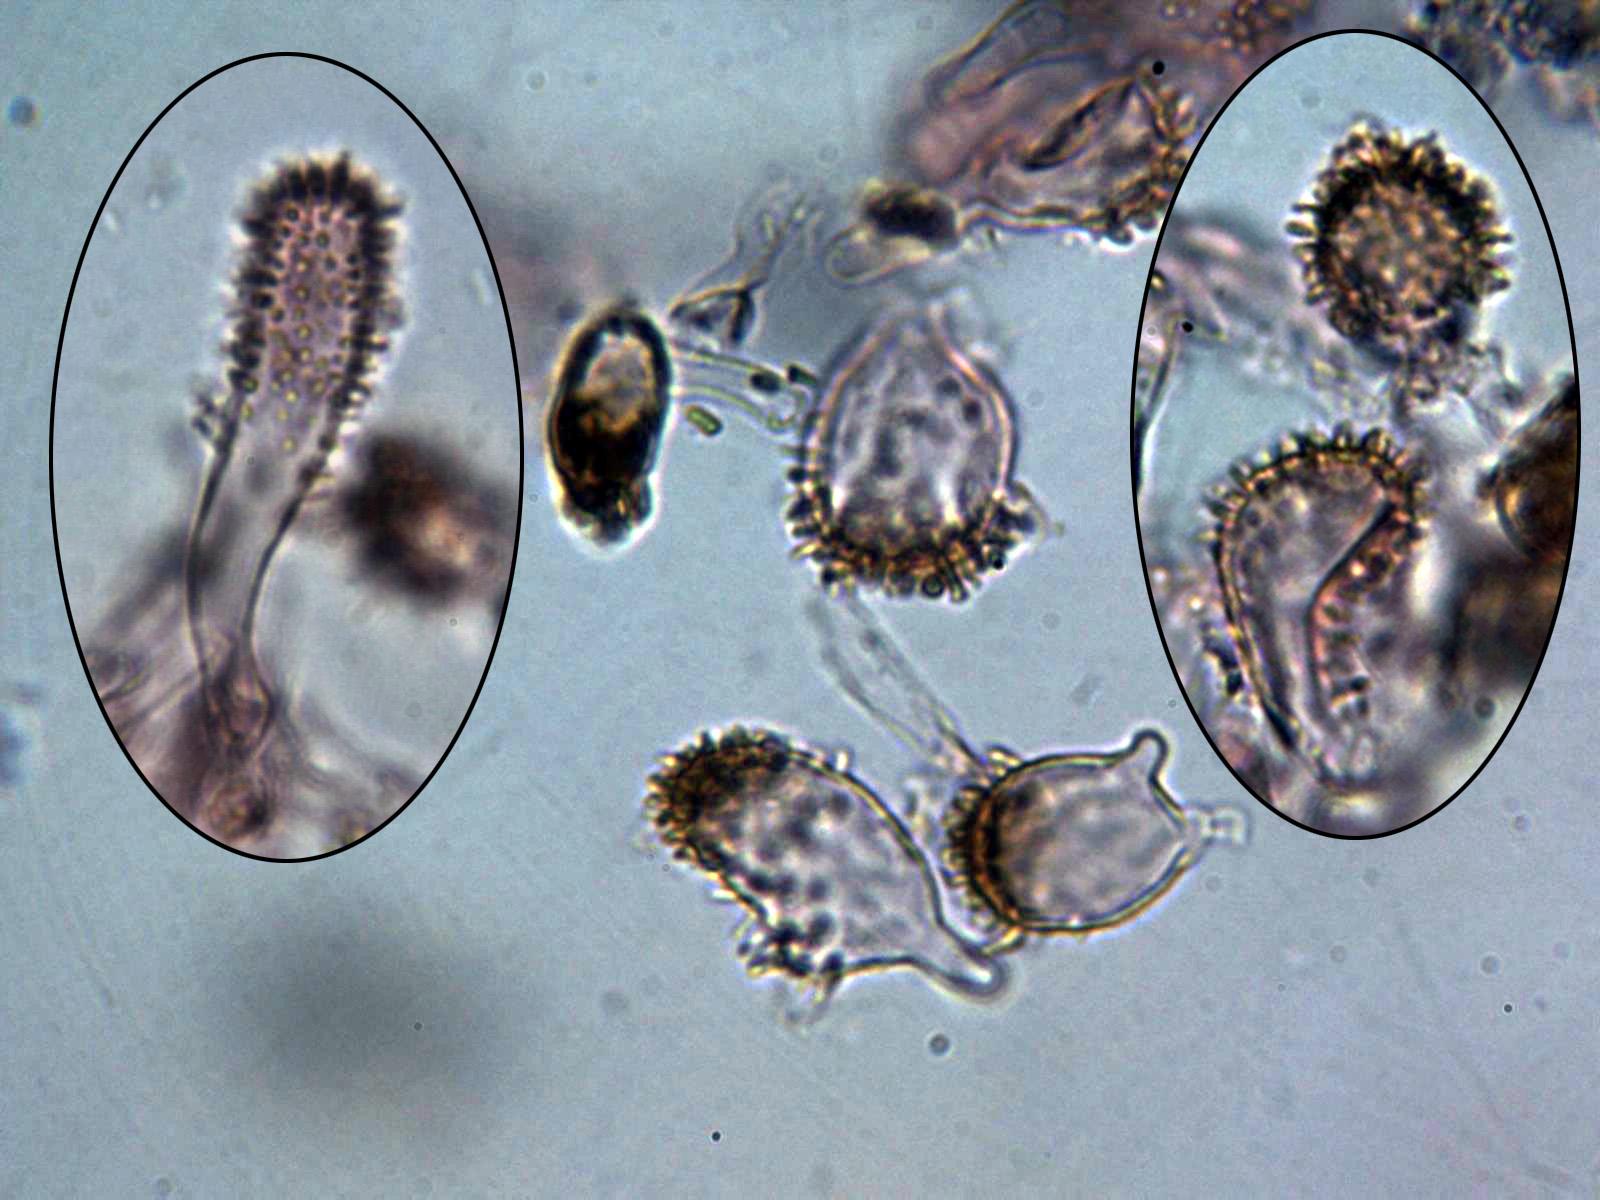 Clulasepitelialesycistidio.jpg